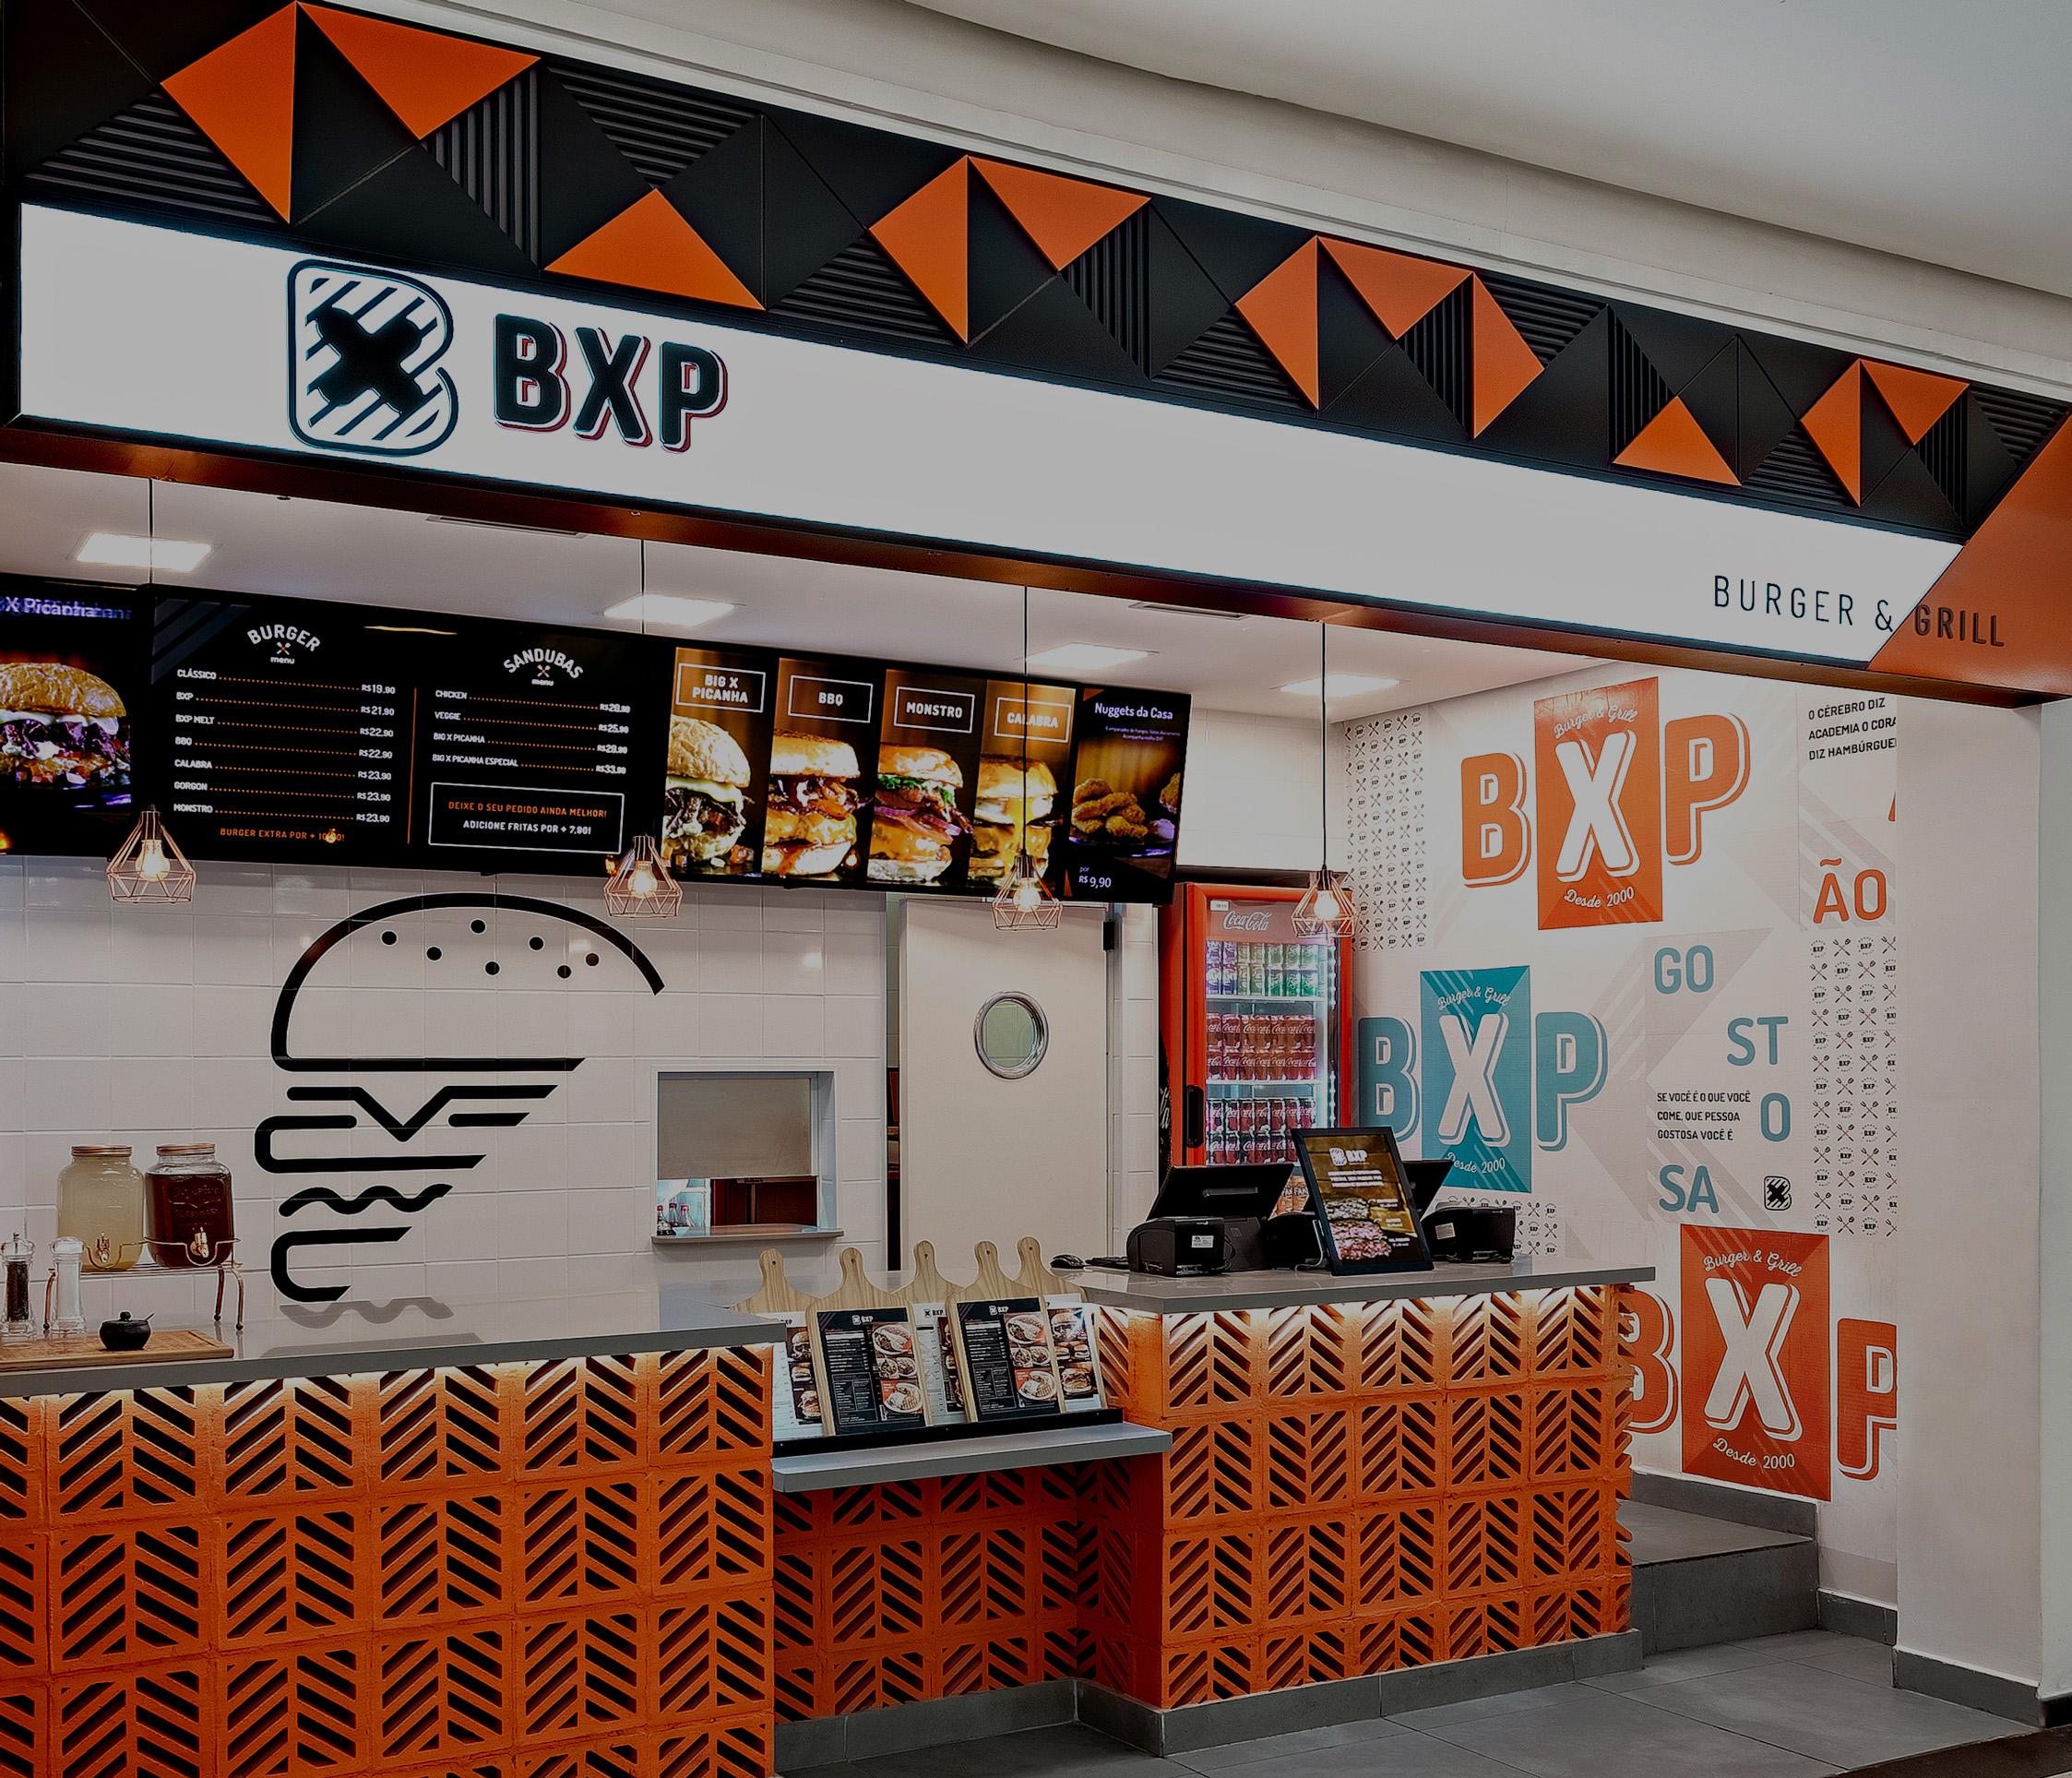 BXP Burger & Grill